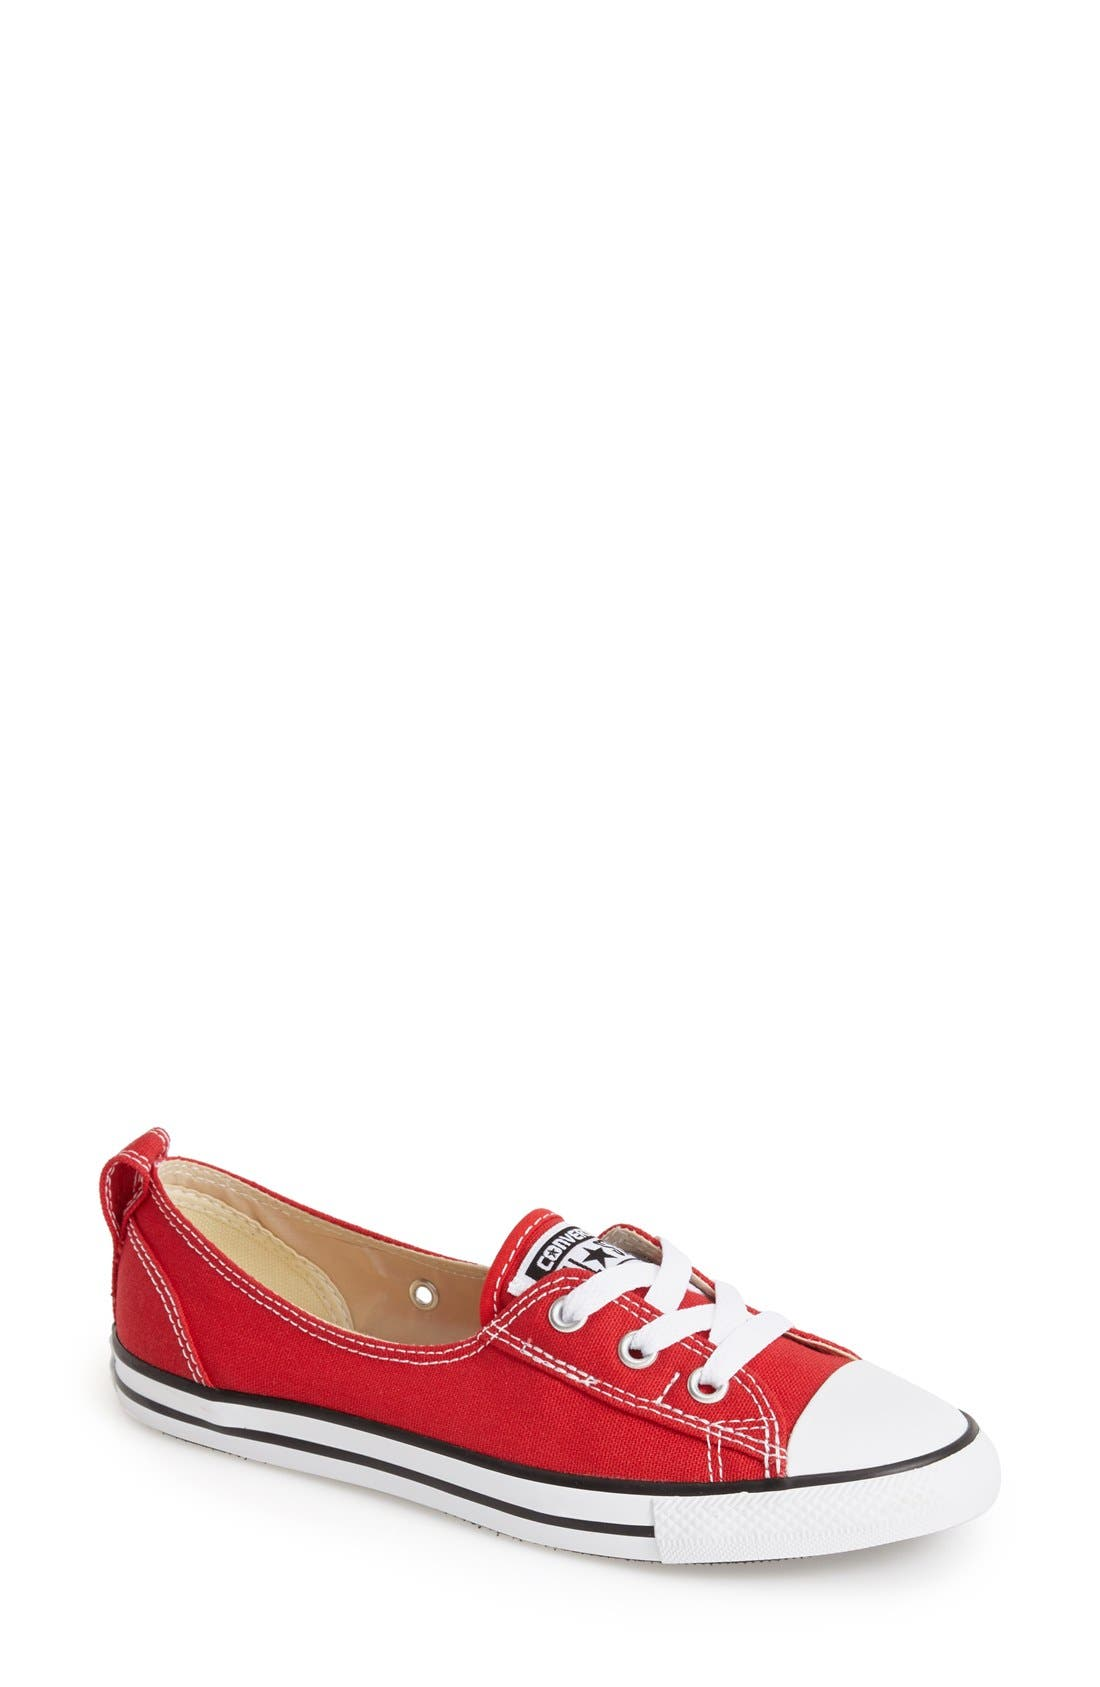 ,                             Chuck Taylor<sup>®</sup> All Star<sup>®</sup> Ballet Canvas Sneaker,                             Main thumbnail 21, color,                             600